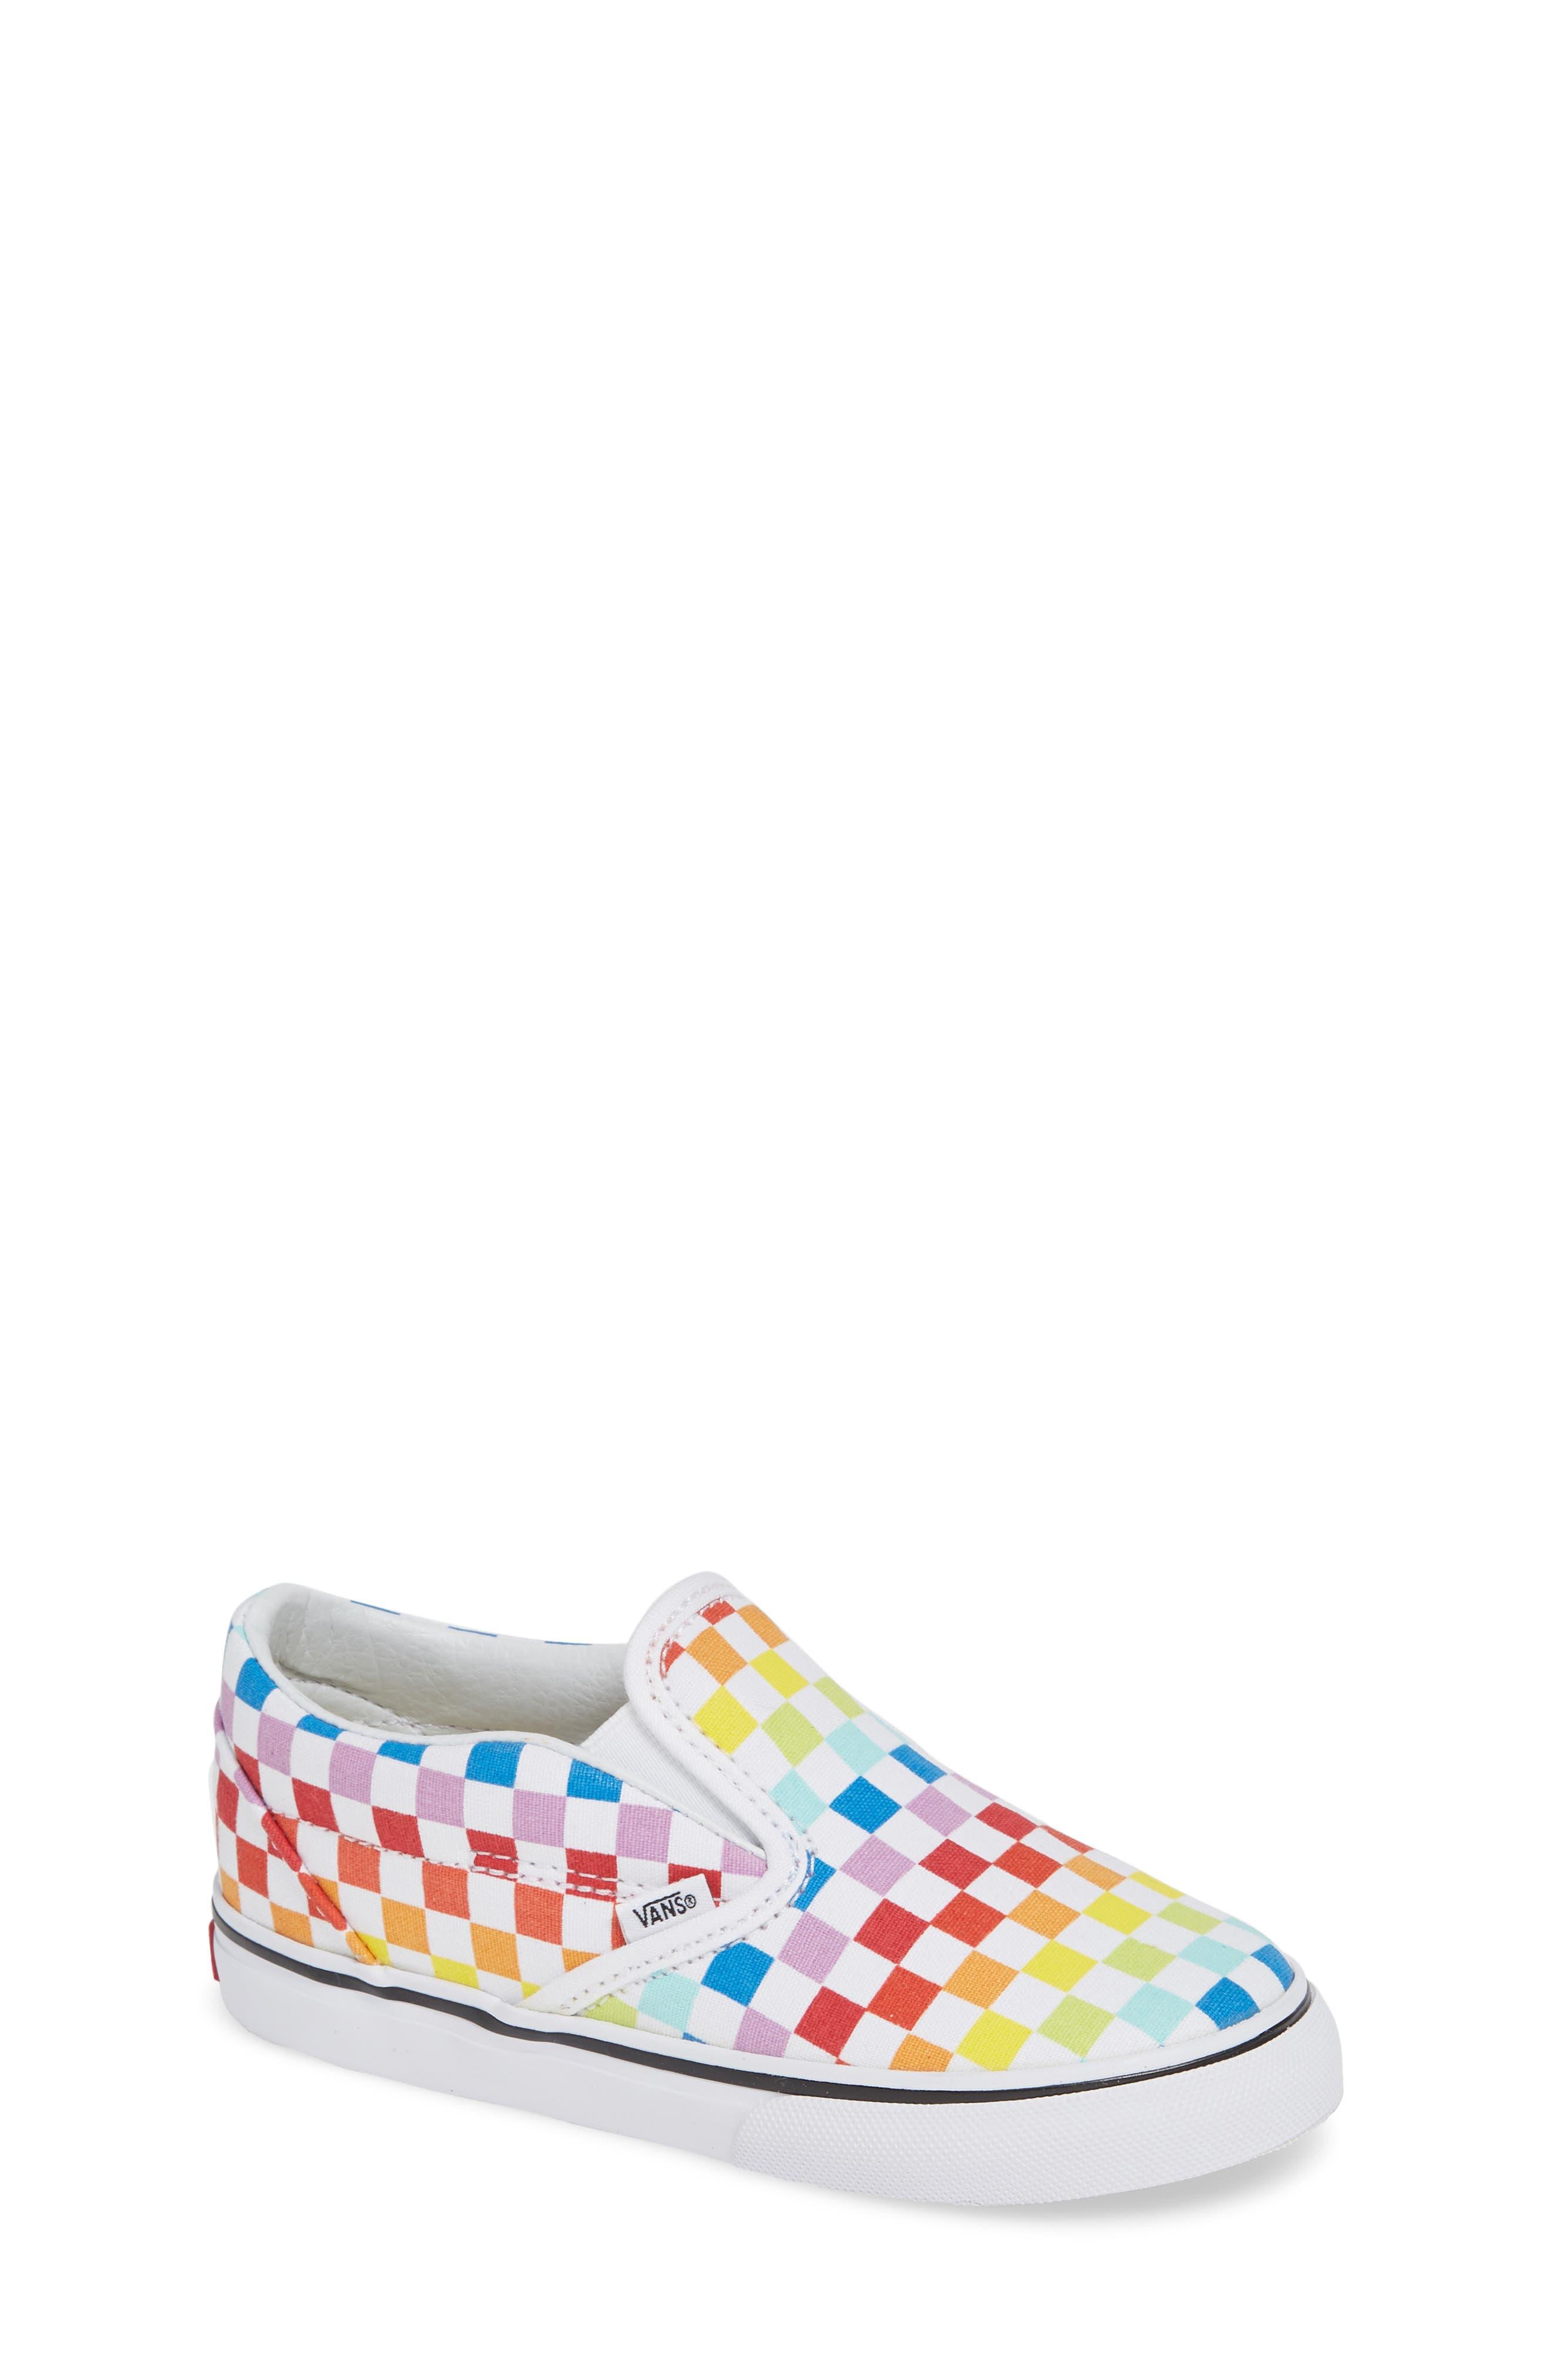 'Classic - Checker' Slip-On,                             Main thumbnail 1, color,                             RAINBOW/ WHITE